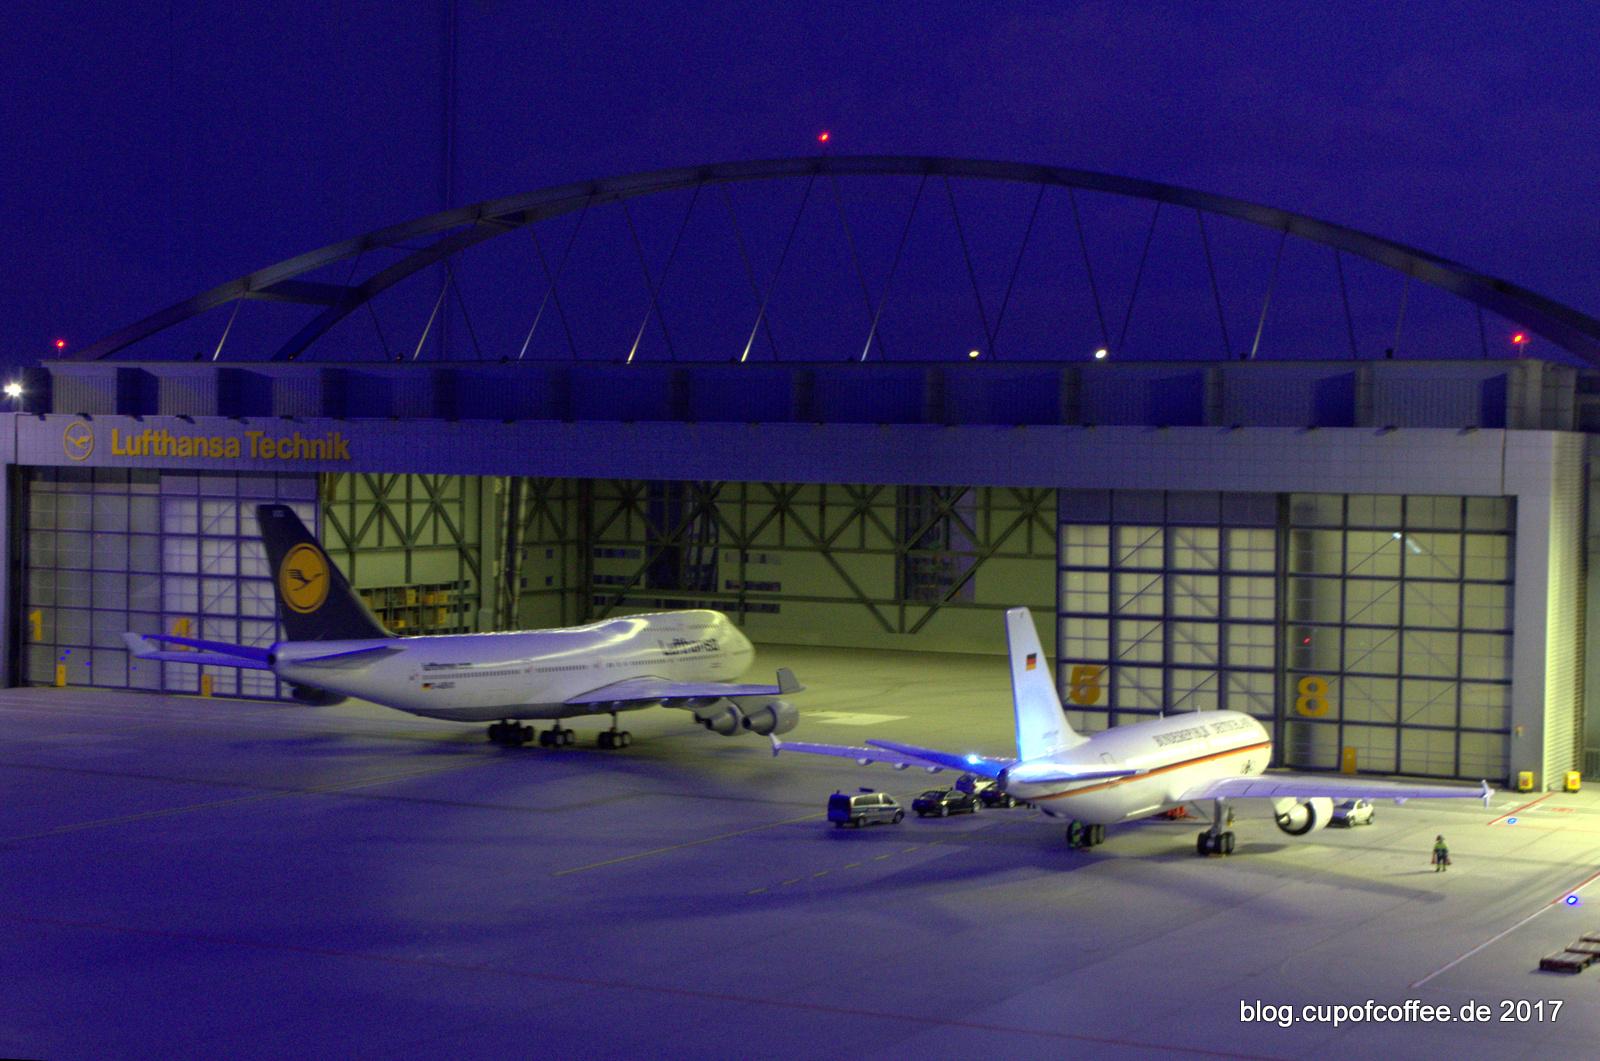 B 747 - Lufthansa